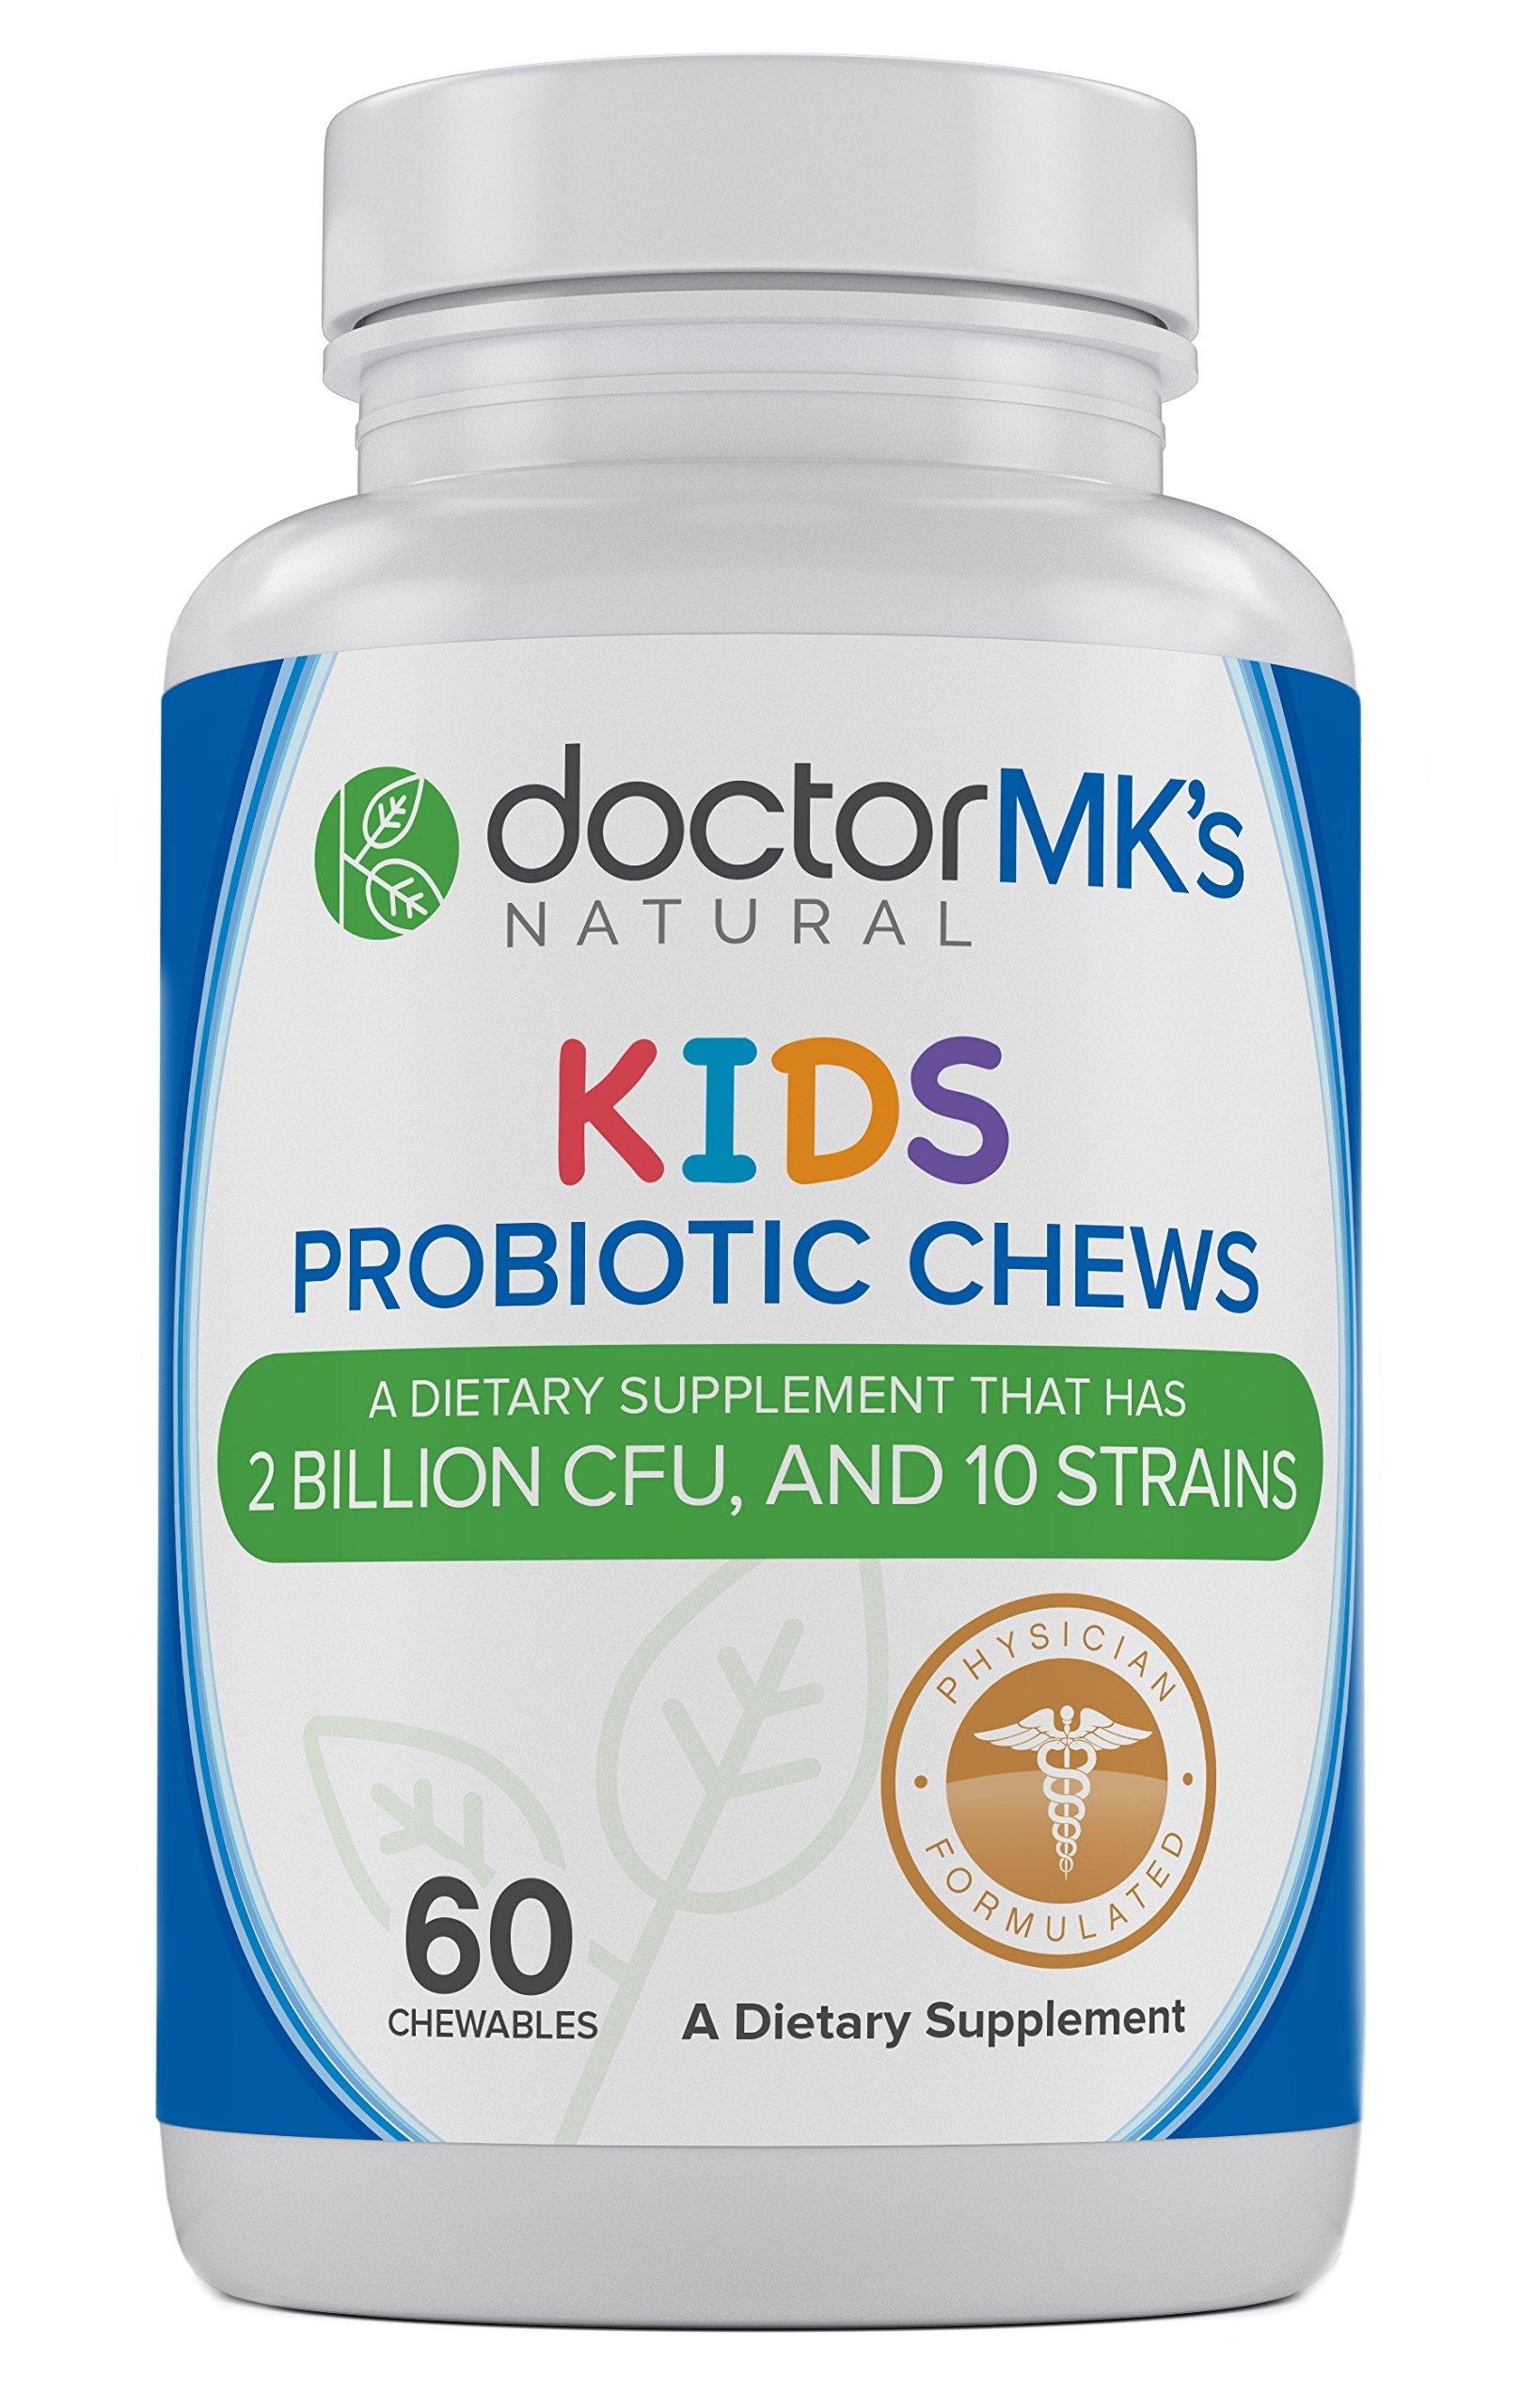 Kids Probiotics Chewable by Doctor MK's, Sugar Free Animal Shapes, Tastes Like Candy, Natural Wild Berry Tablets, Vegetarian/Vegan